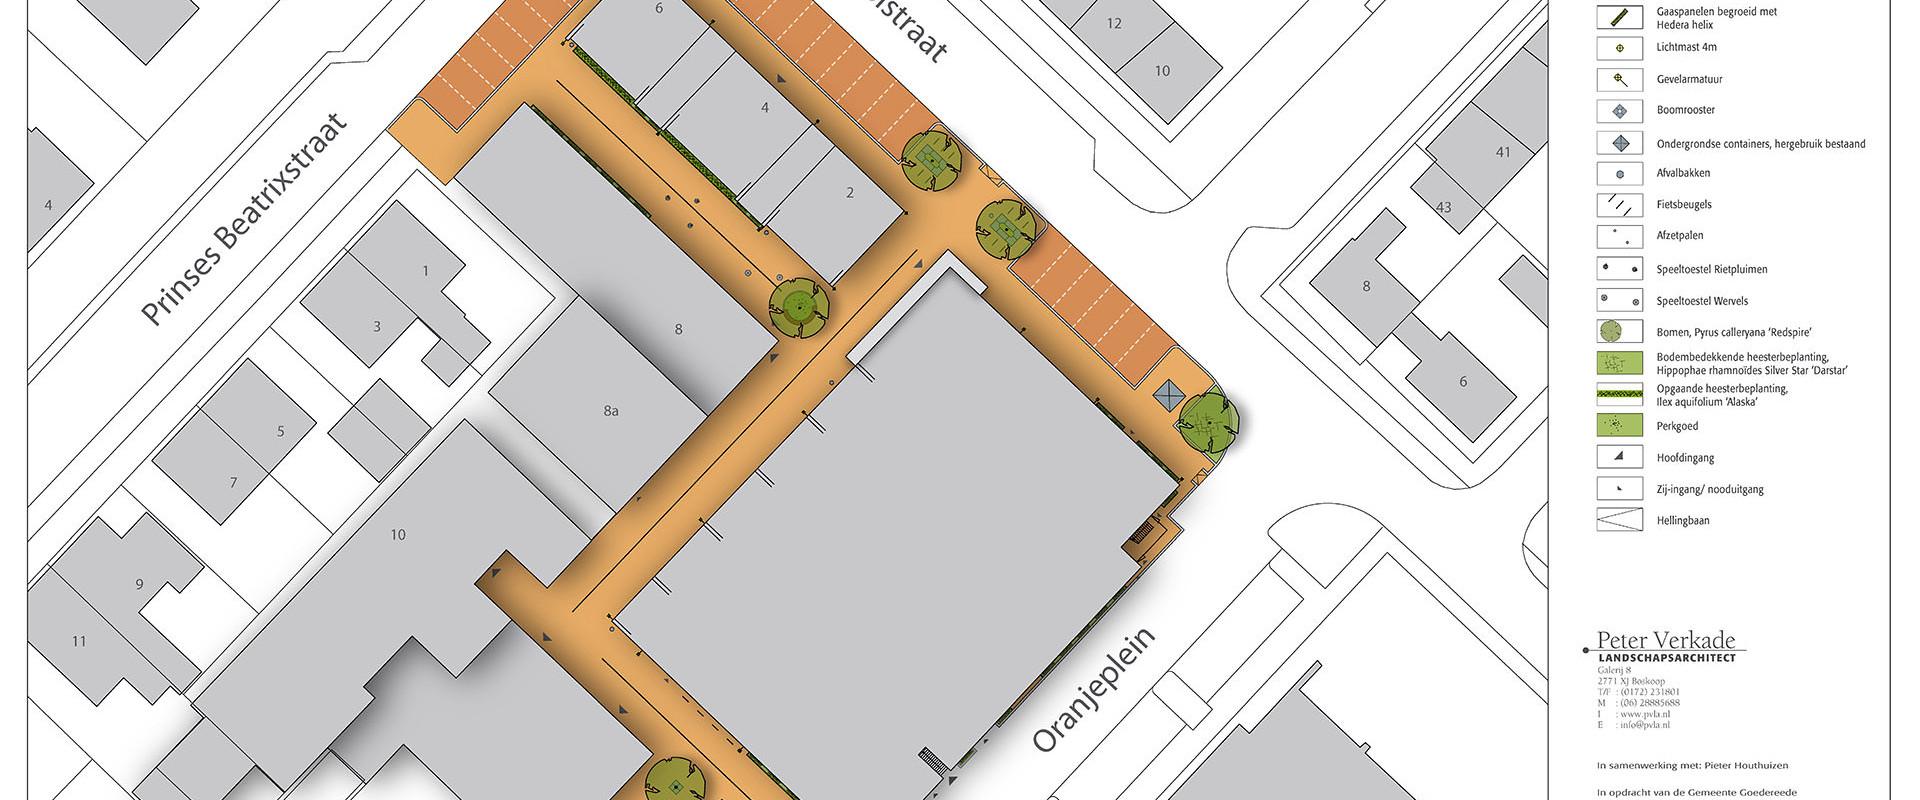 091118_ DO inrichtingsplan Oranjeplein presentatietekening